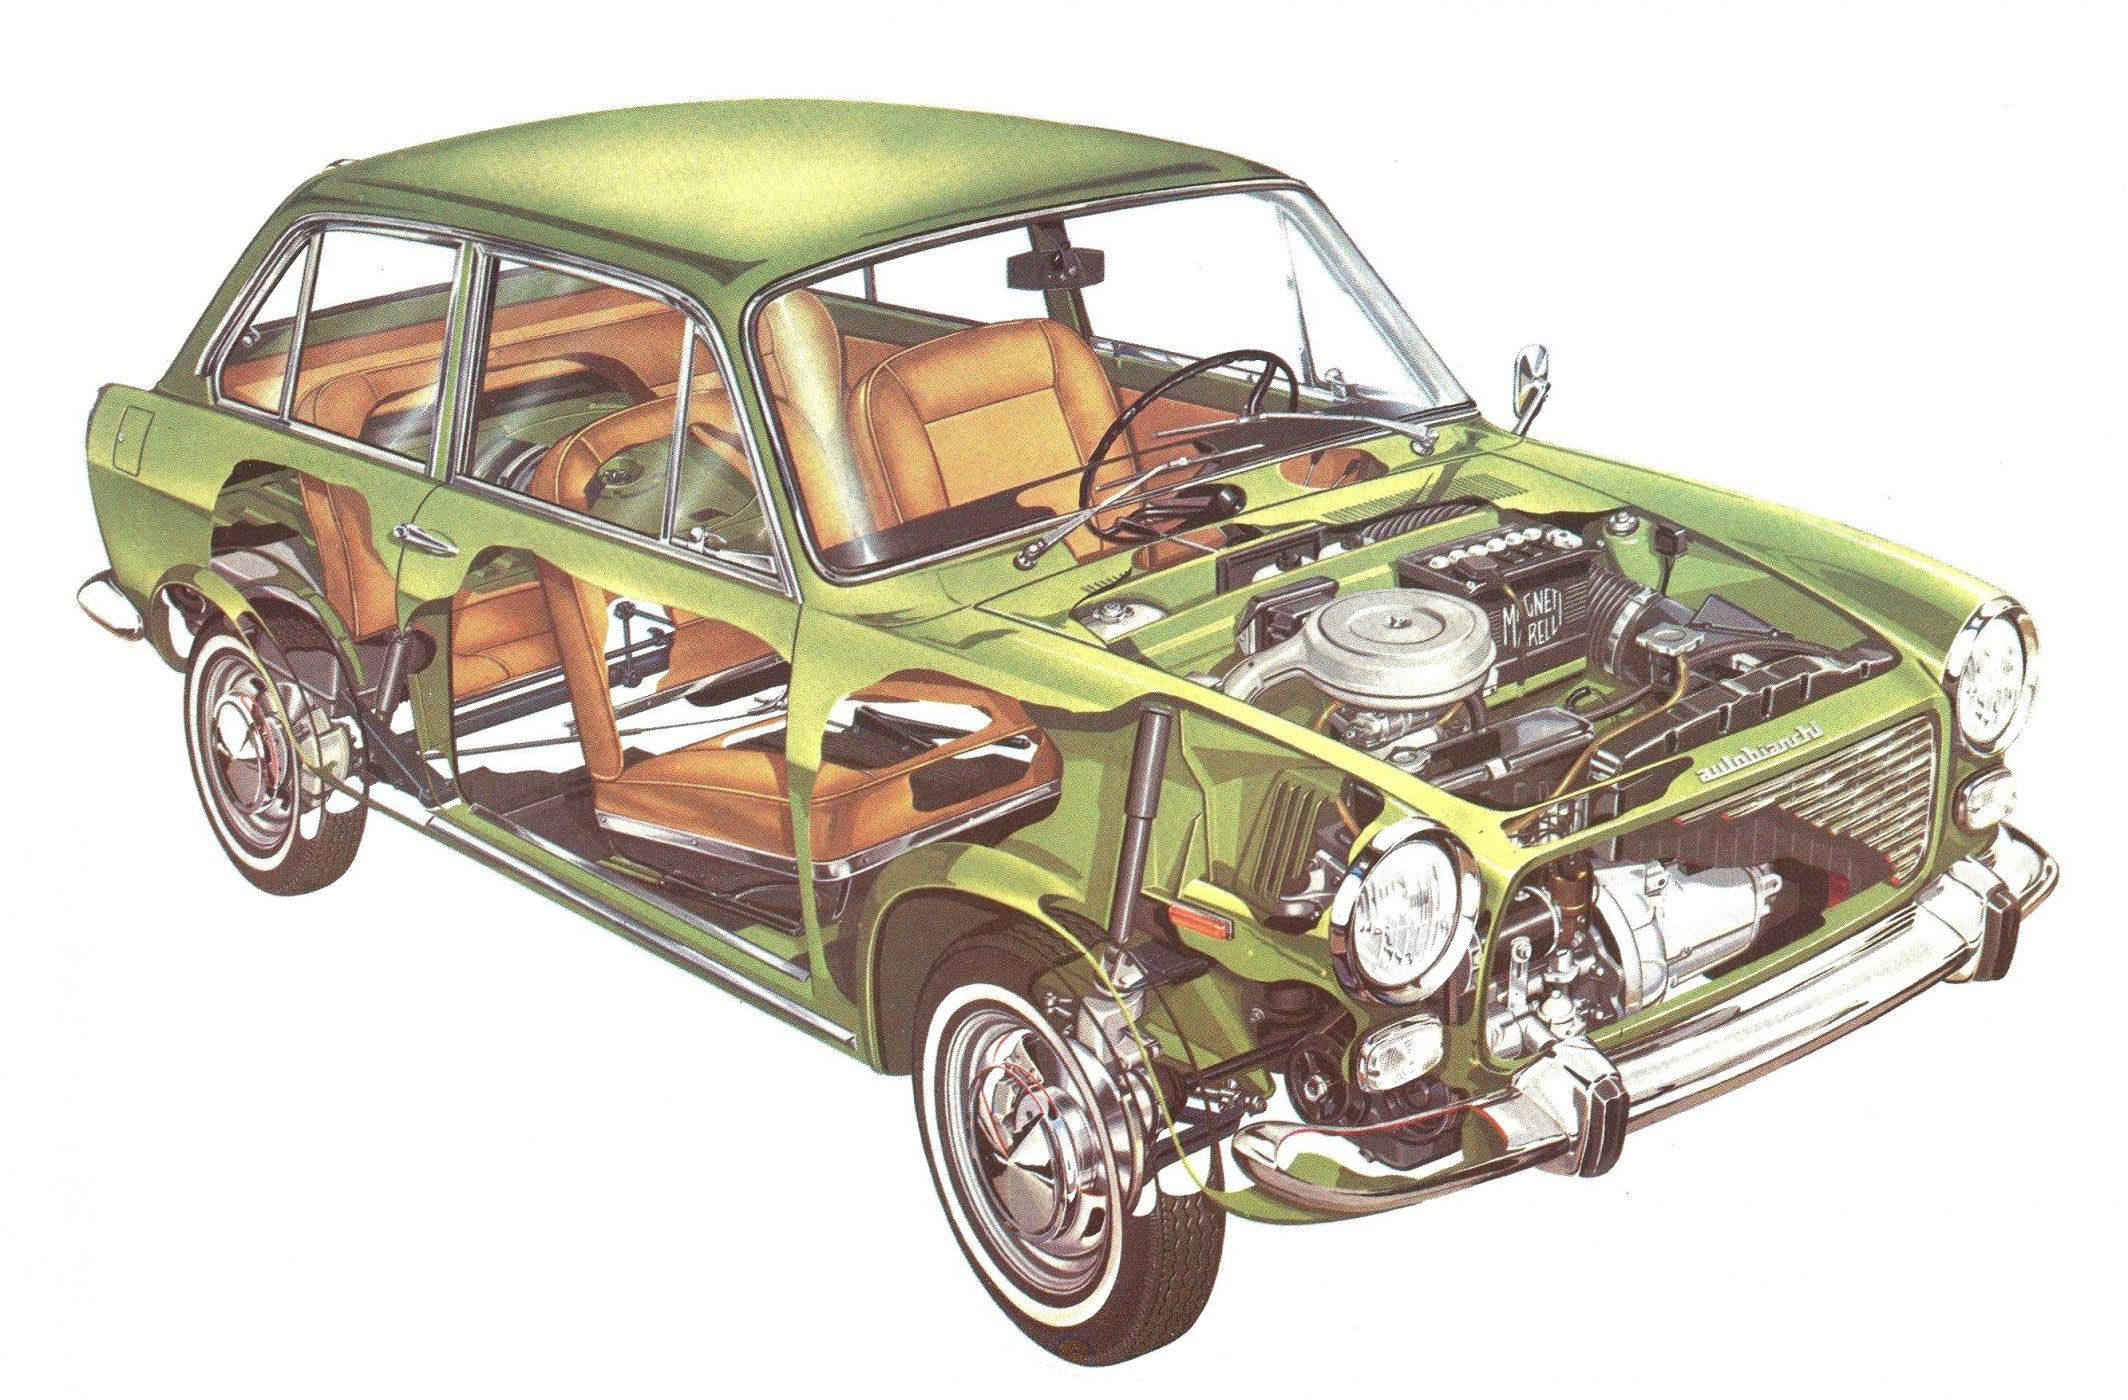 Autobianchi Primula cutaway